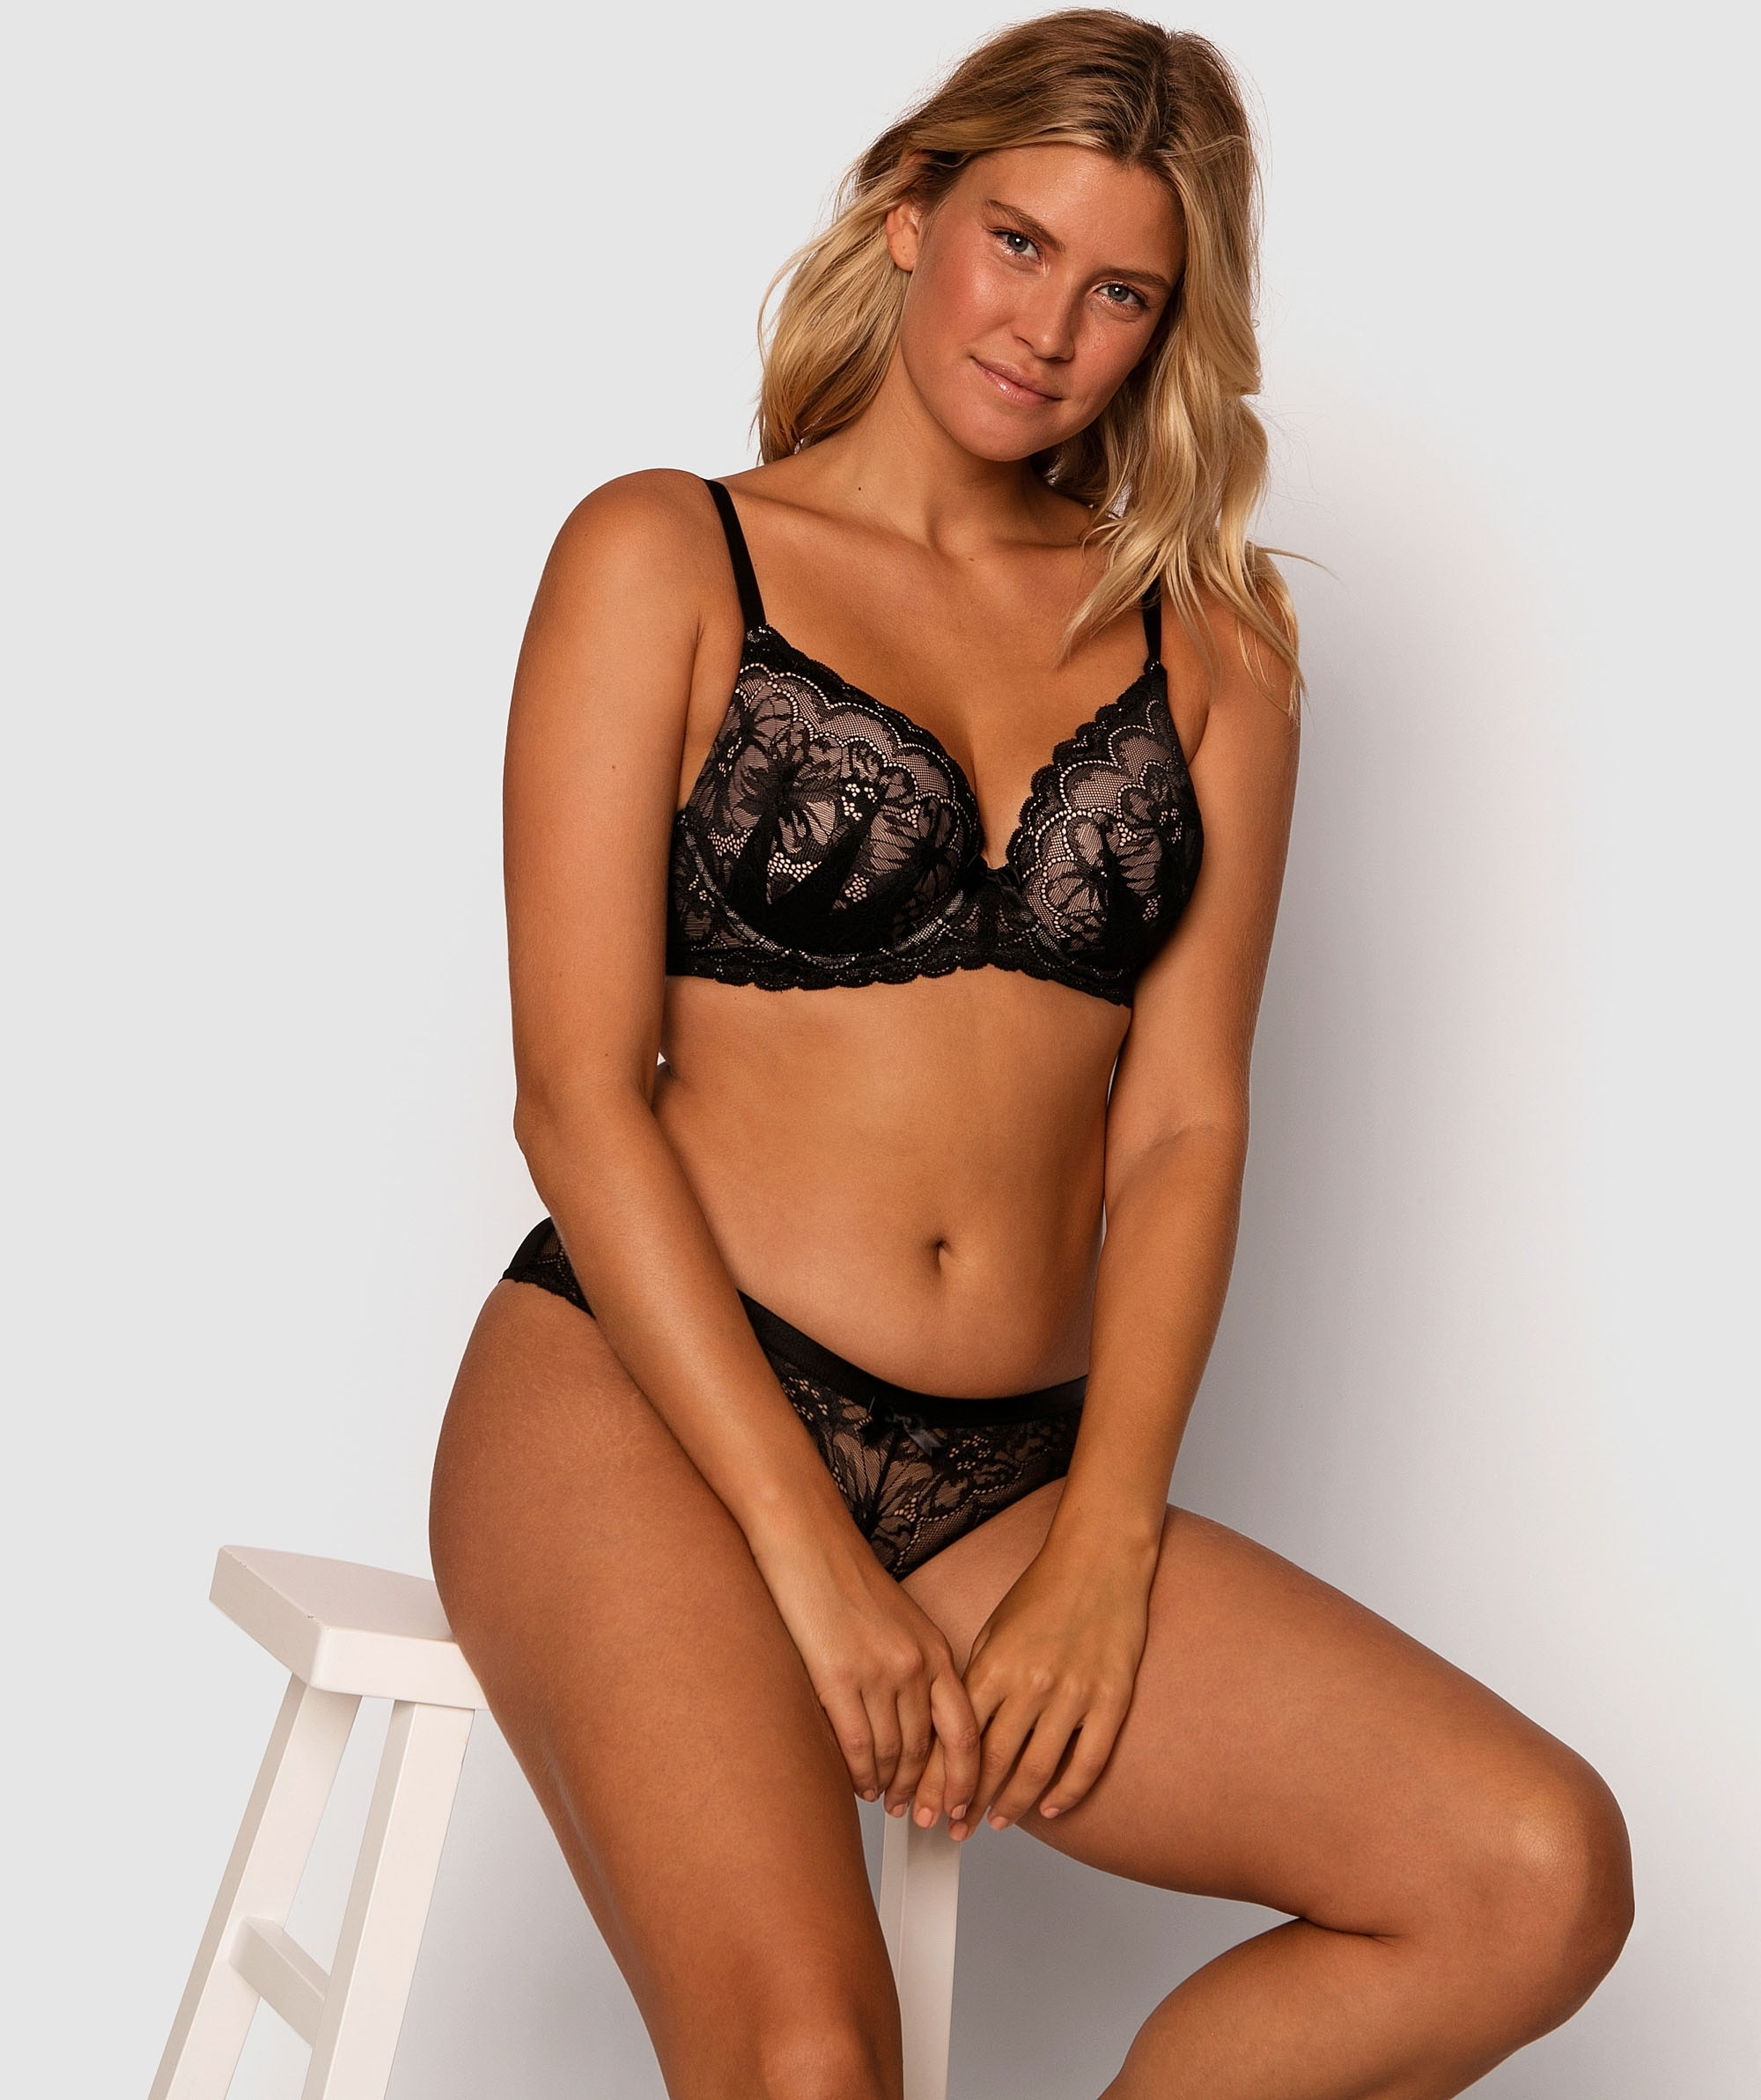 Posie Lace Full Cup Bra - Black